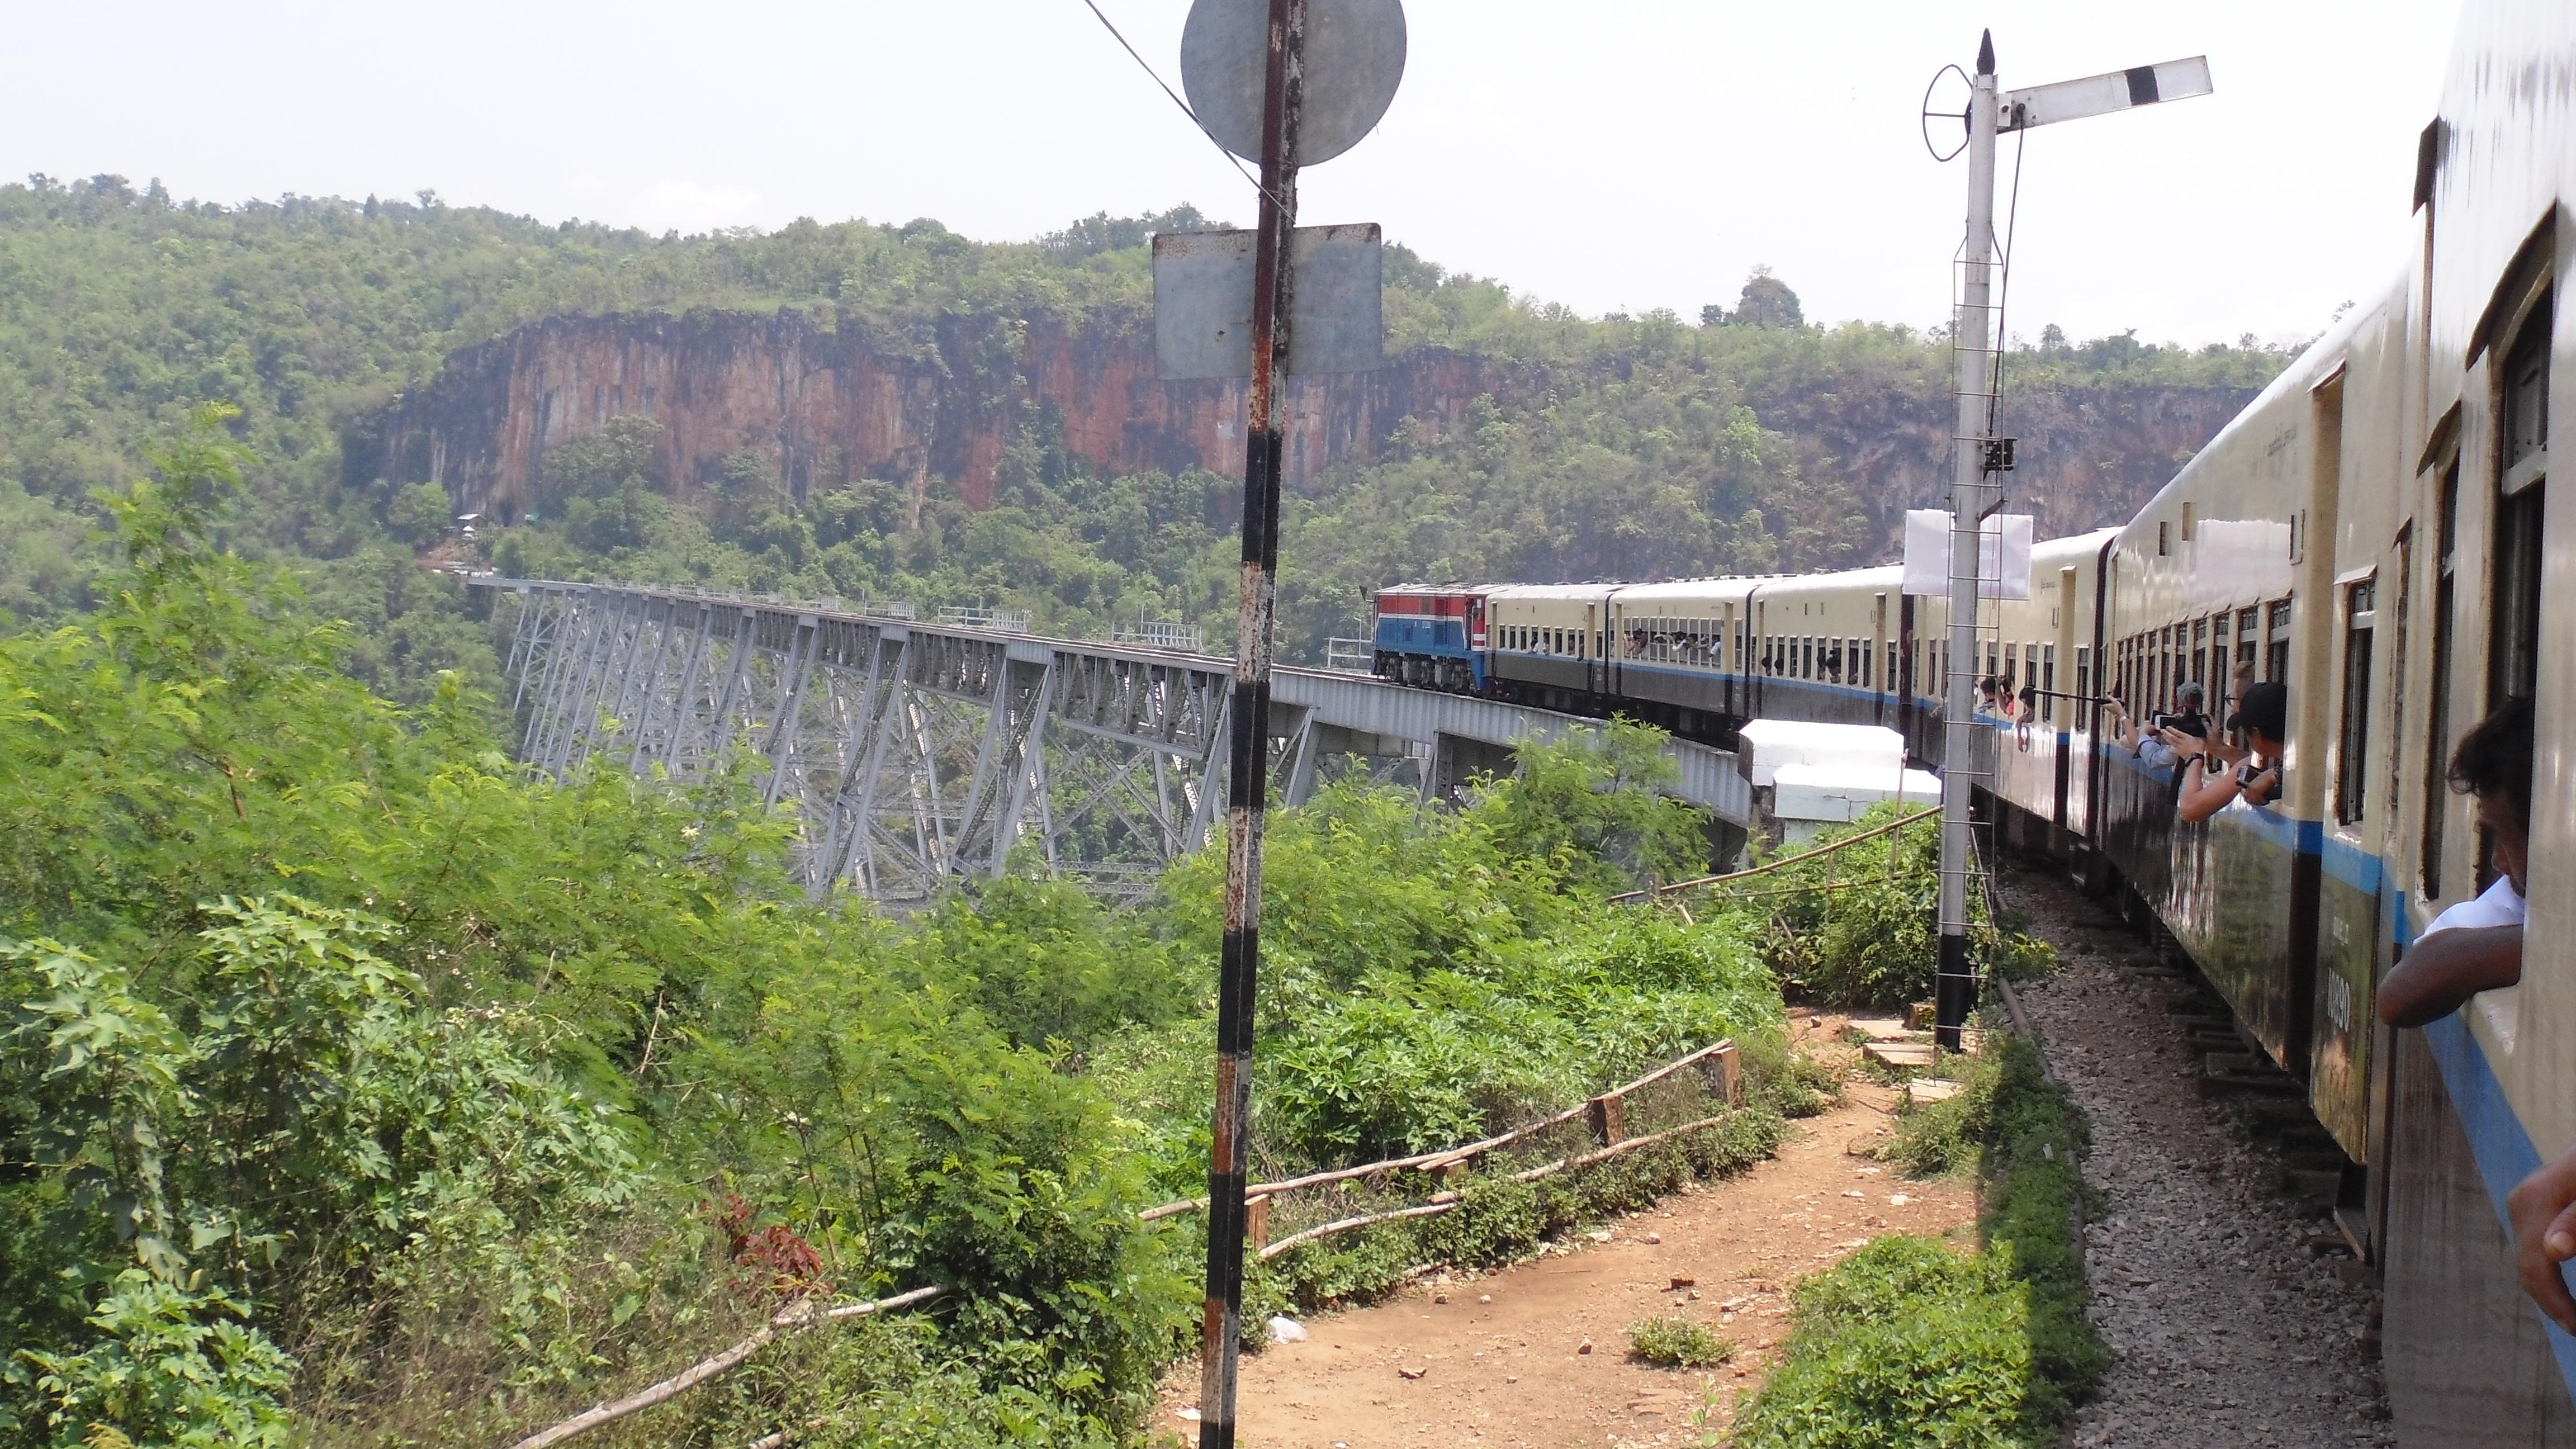 Train to Gokteik Viaduct